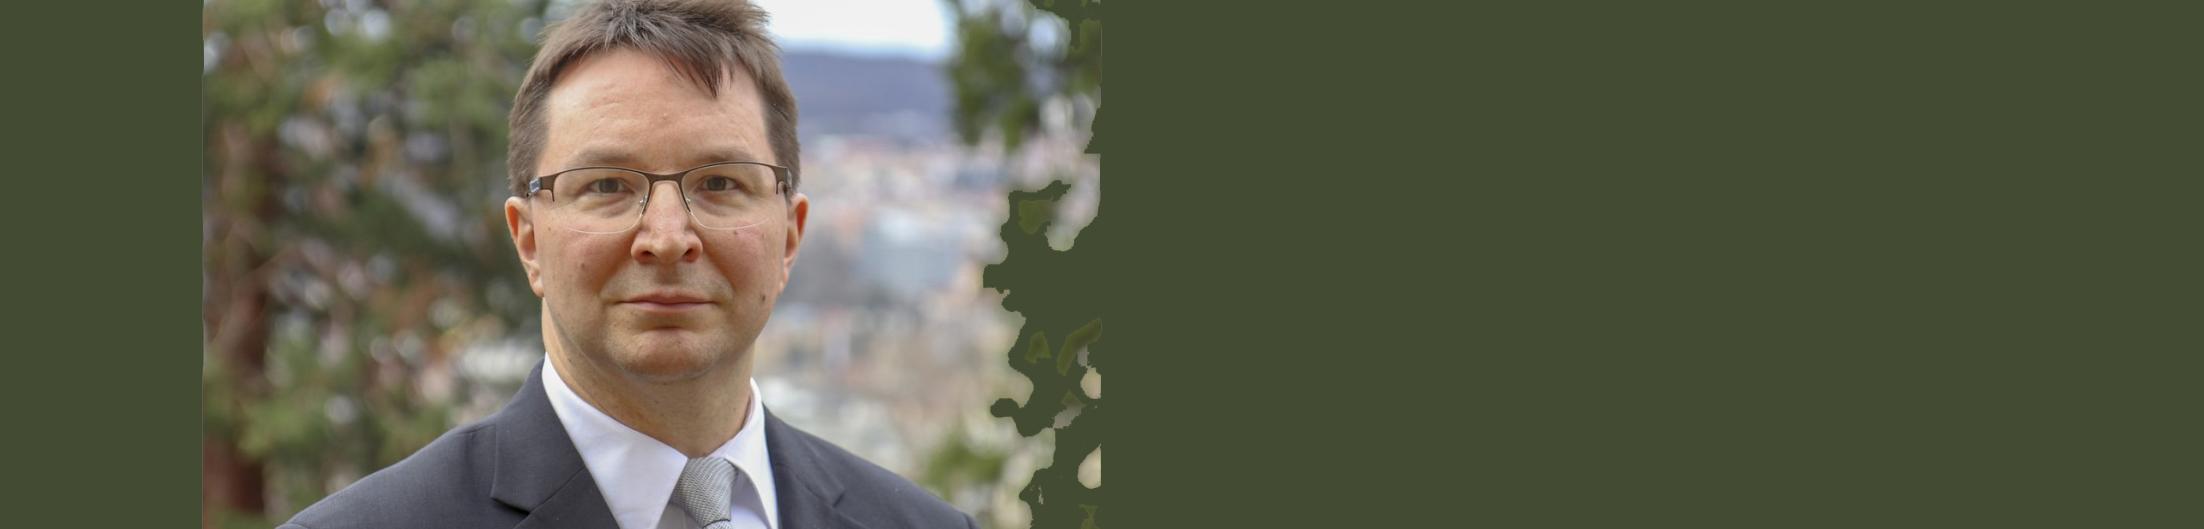 Dr. Michael Blume (Bild: Land BW)